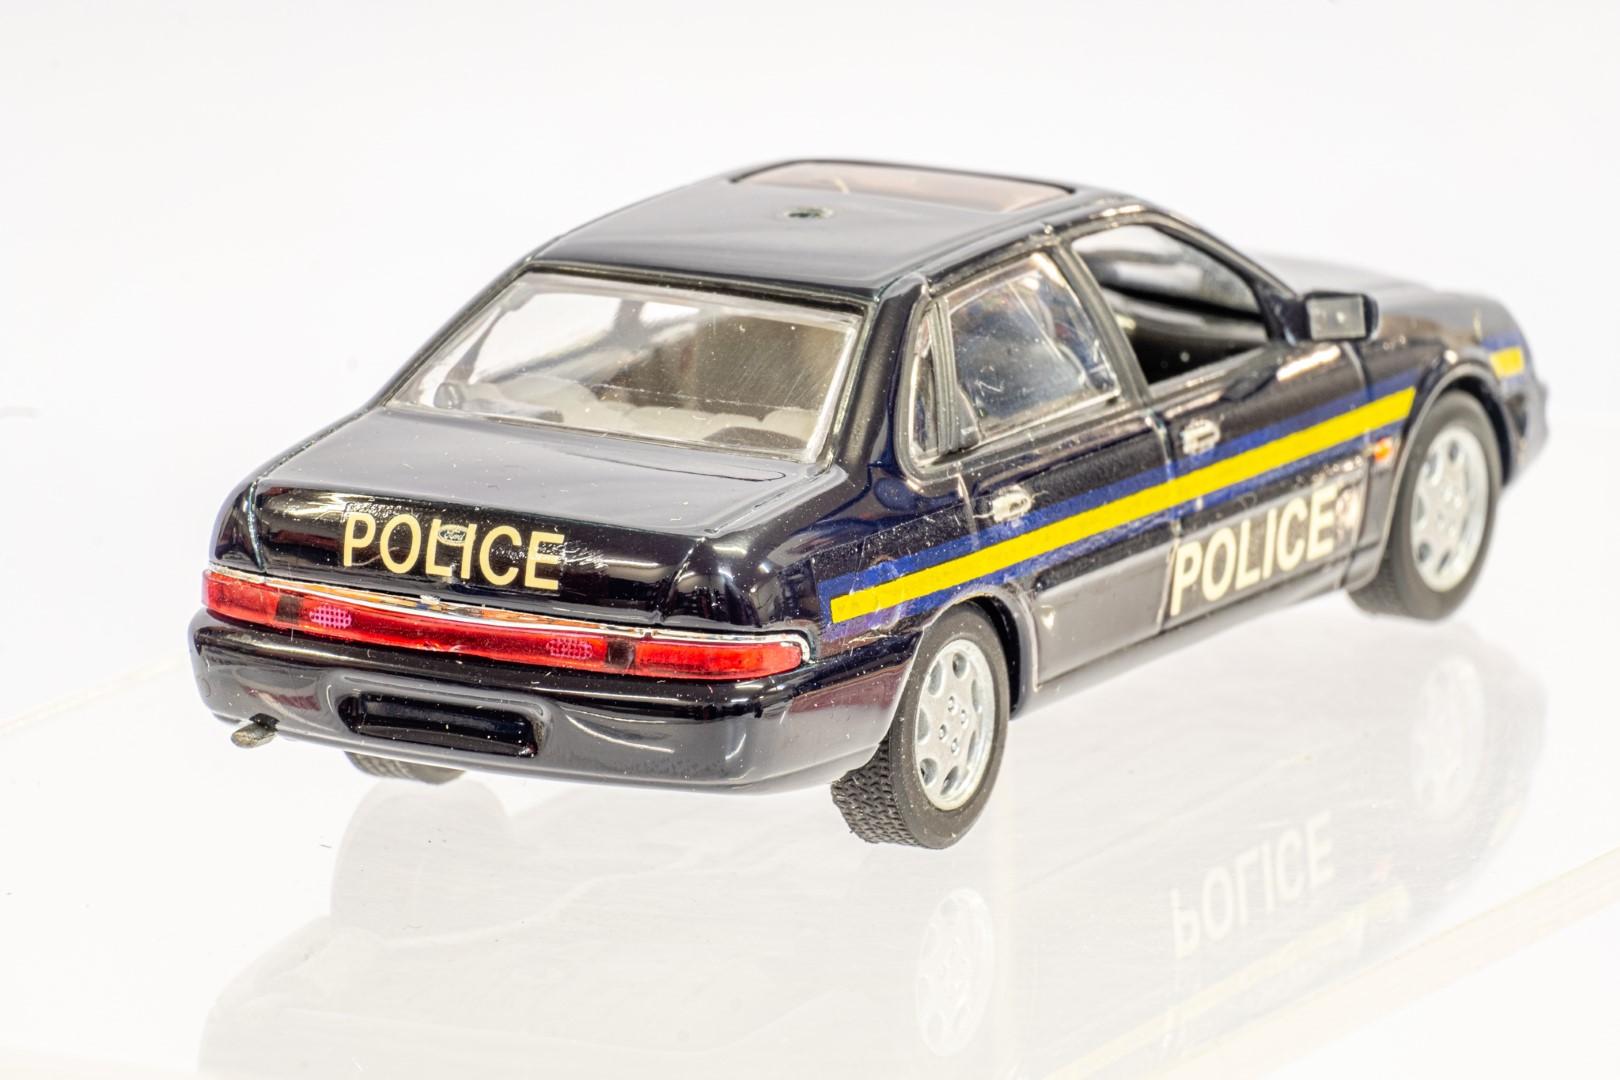 Automax Ford Granada - Police - Code 3 - Image 6 of 7